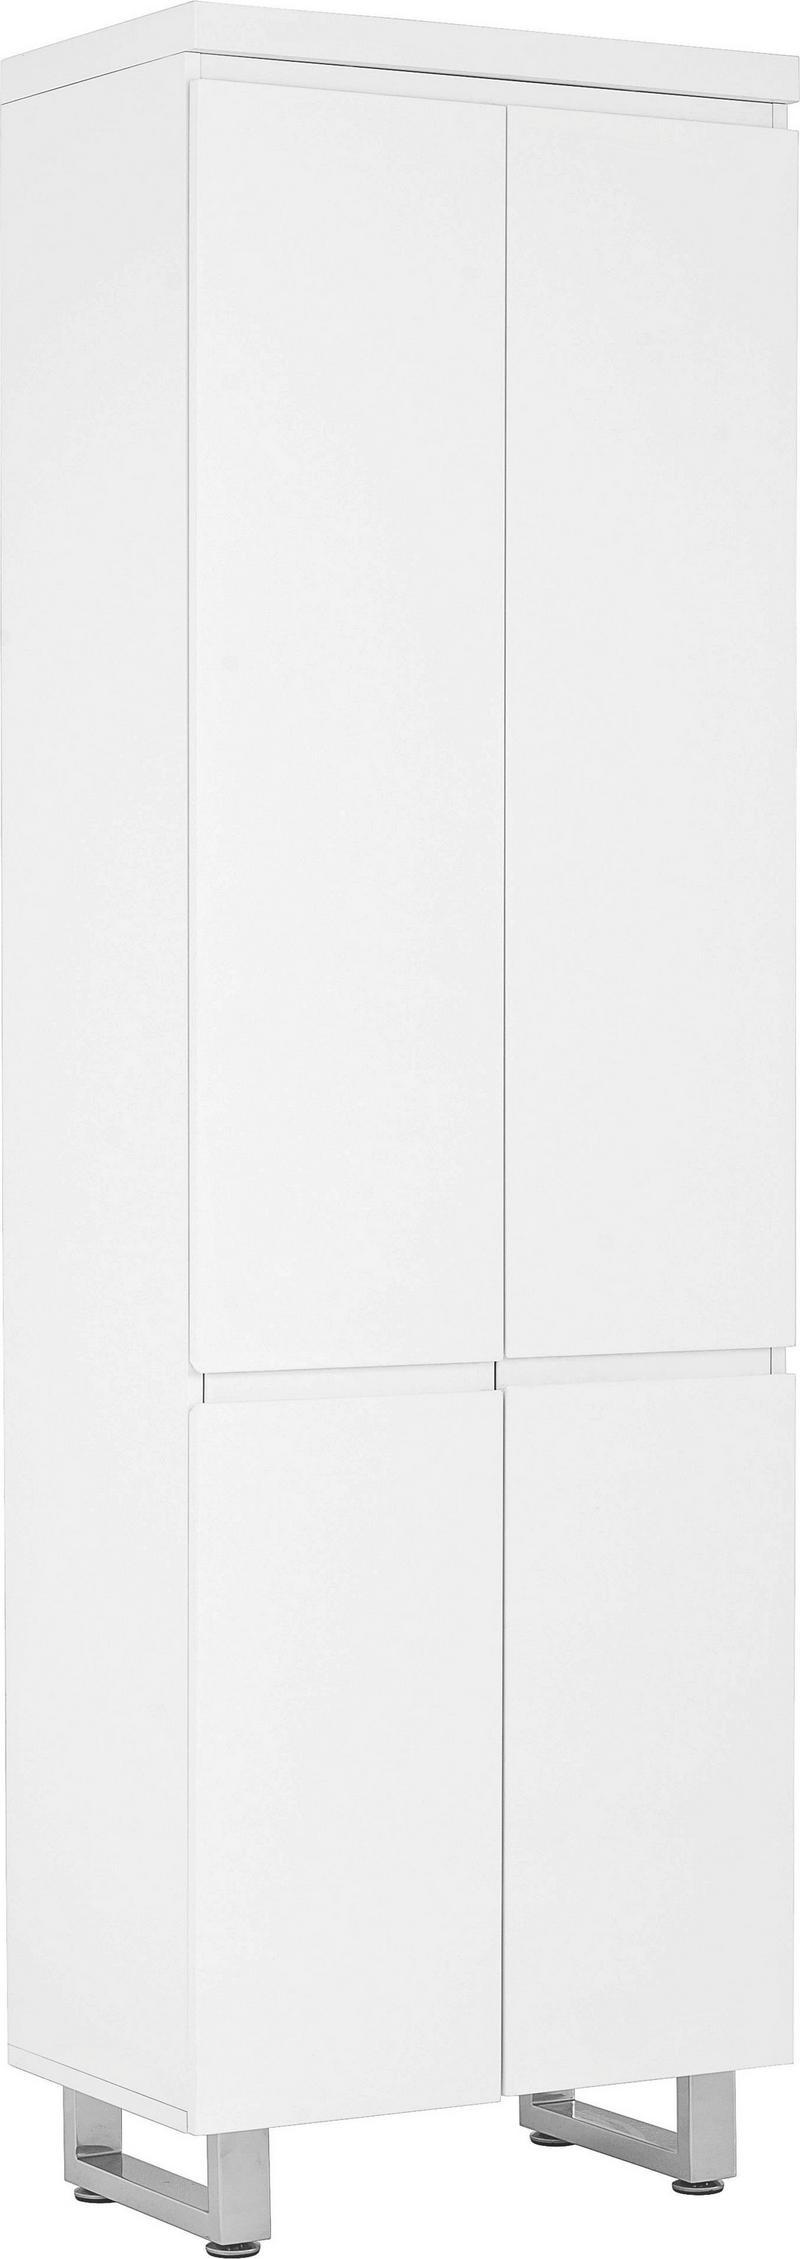 GARDEROB - vit, Design, träbaserade material (62/195/38cm) - Carryhome